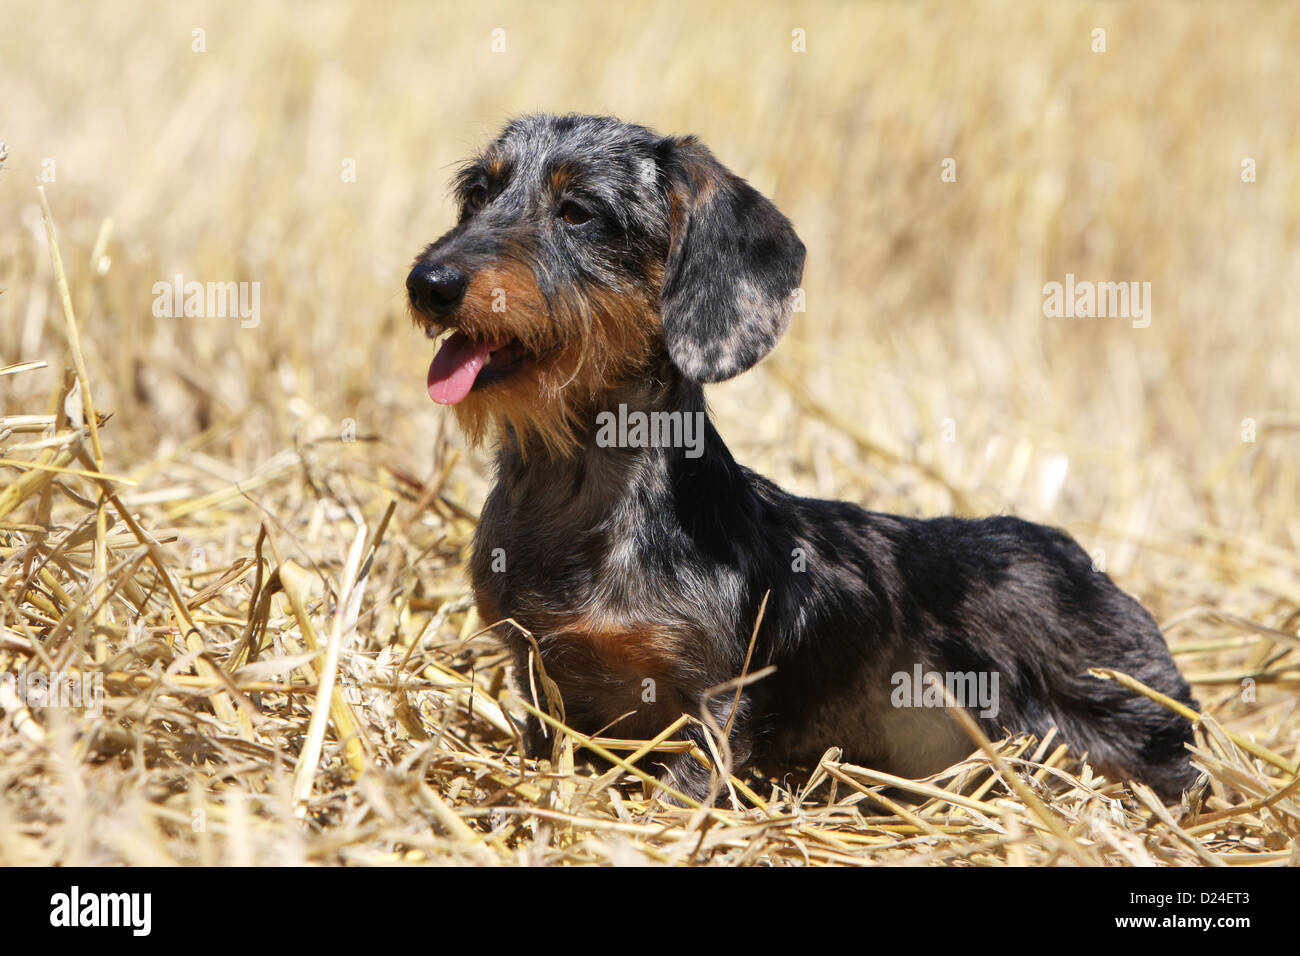 Dog Dachshund Dackel Teckel Wirehaired Merle